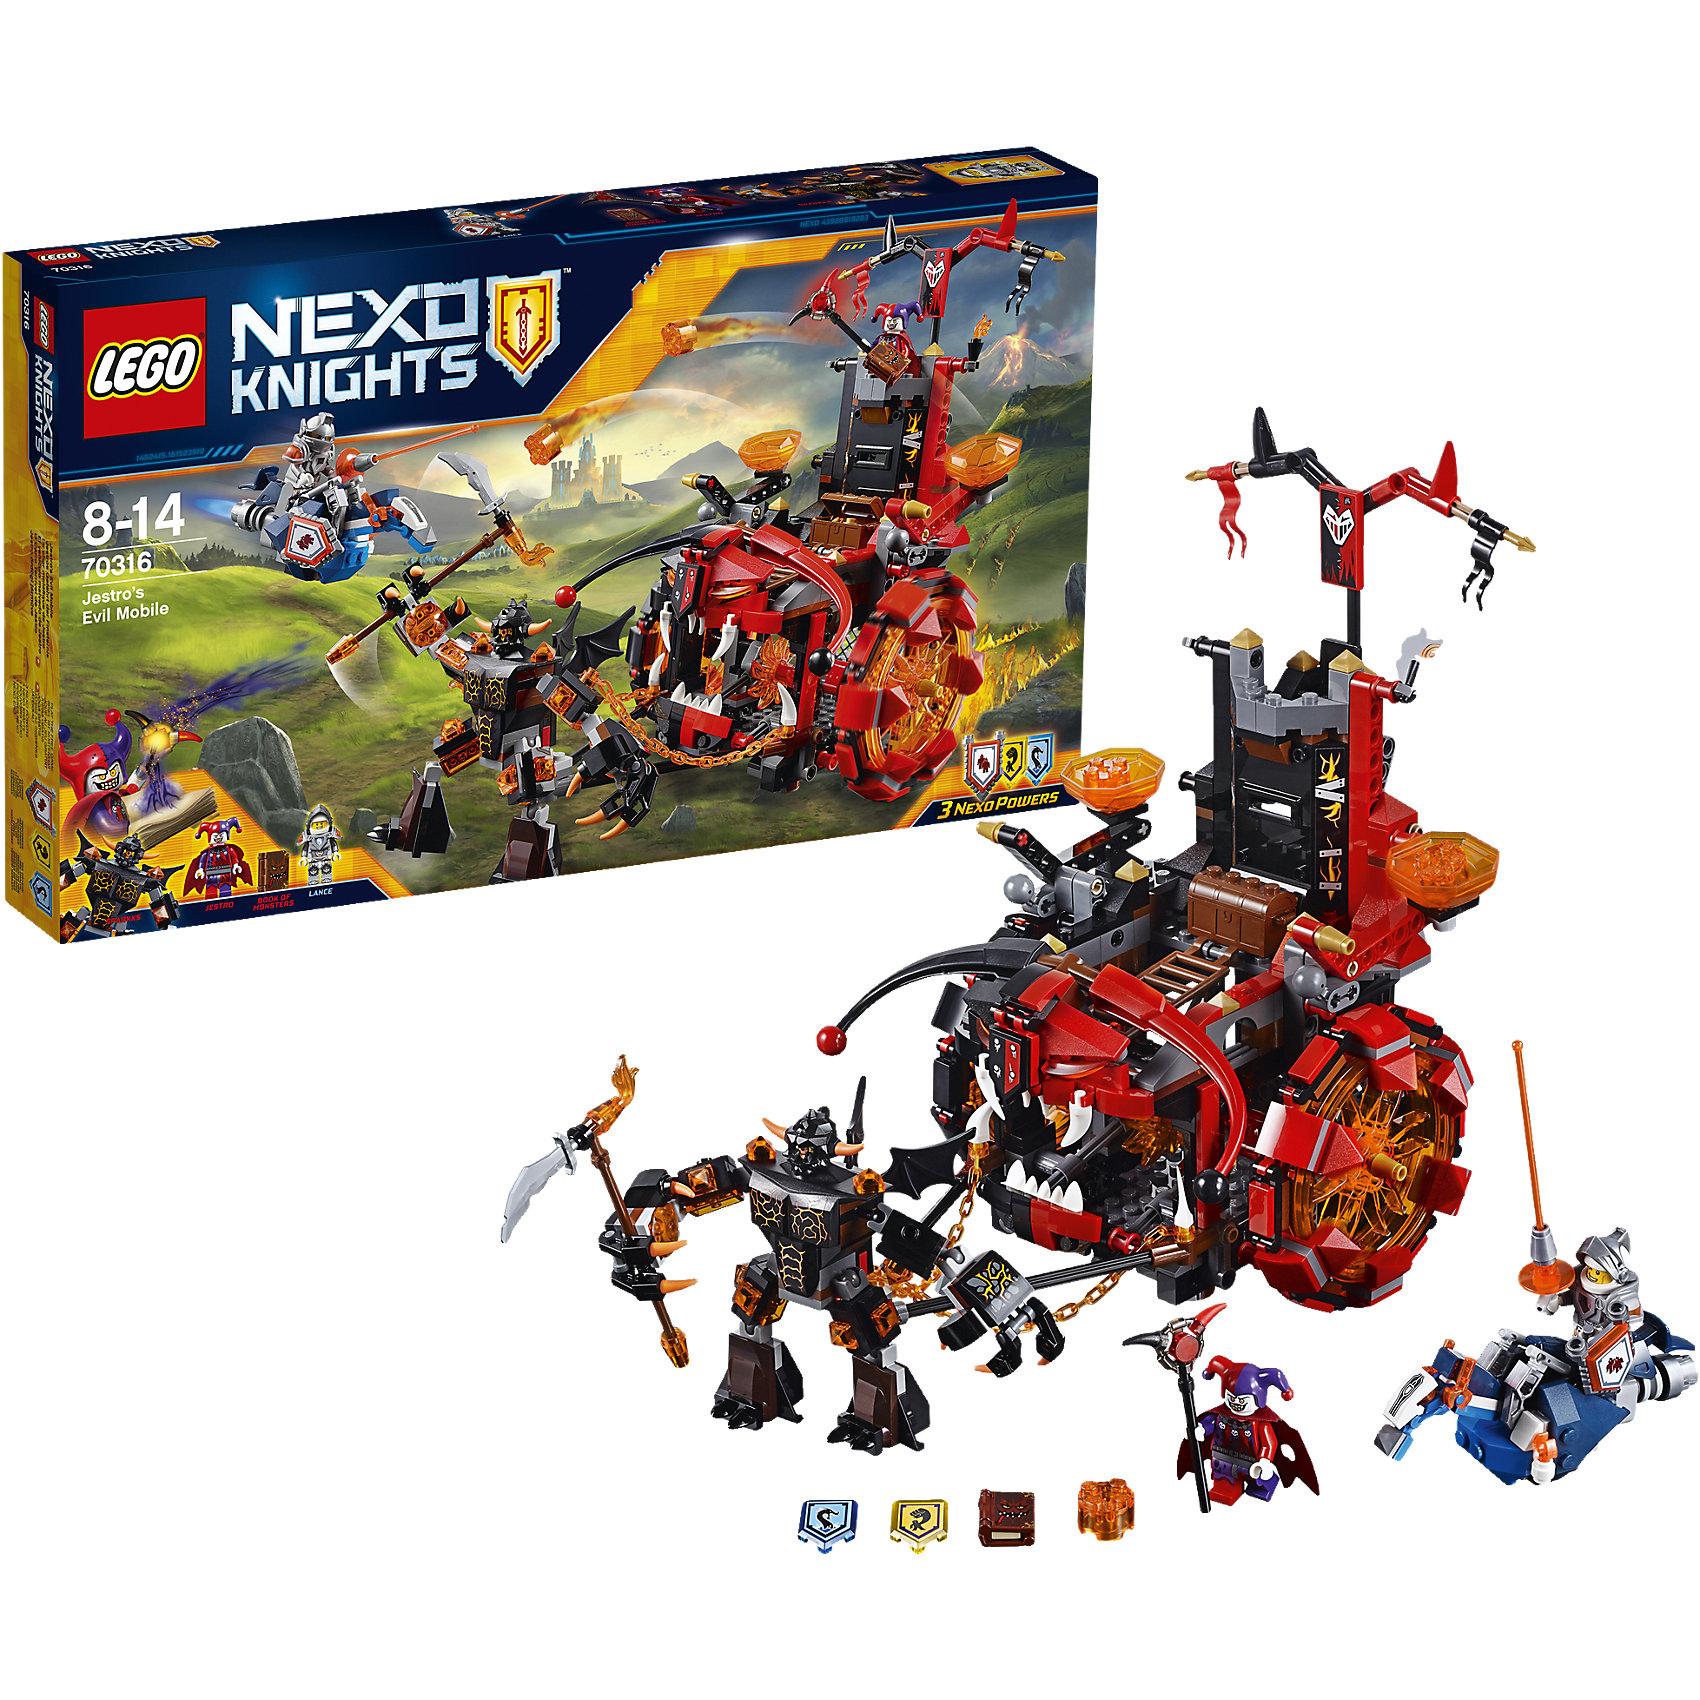 LEGO LEGO NEXO KNIGHTS 70316: Джестро-мобиль lego джестро мобиль 70316